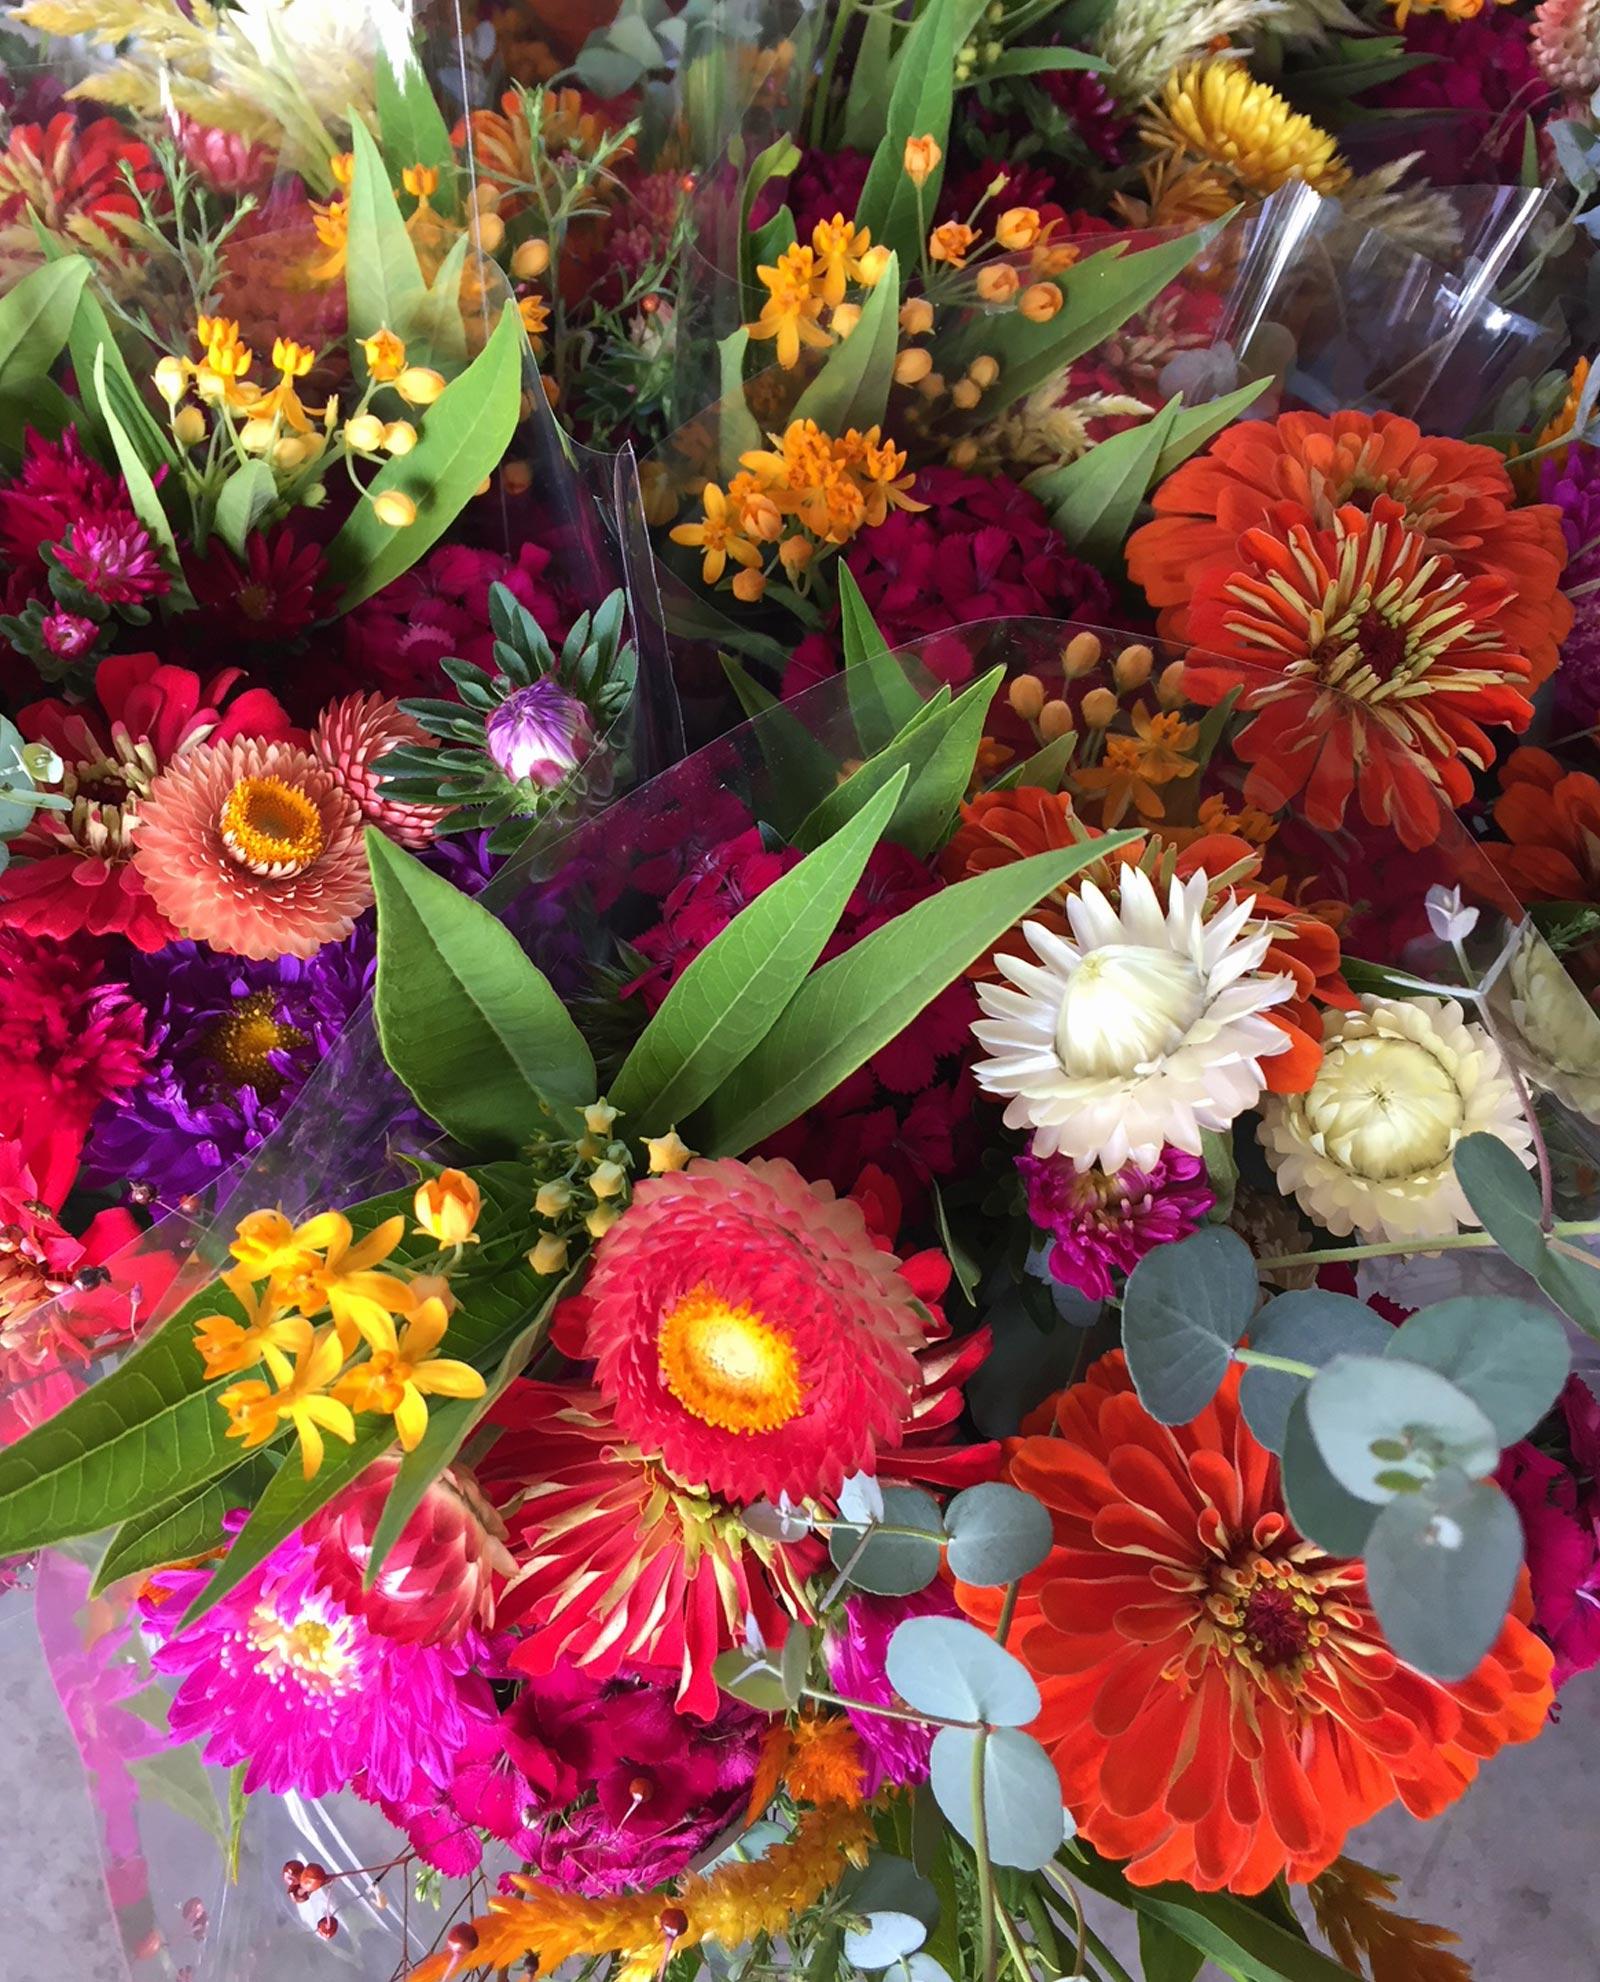 Flower Share Membership - Unity Farm, seasonal flowers and organic greens